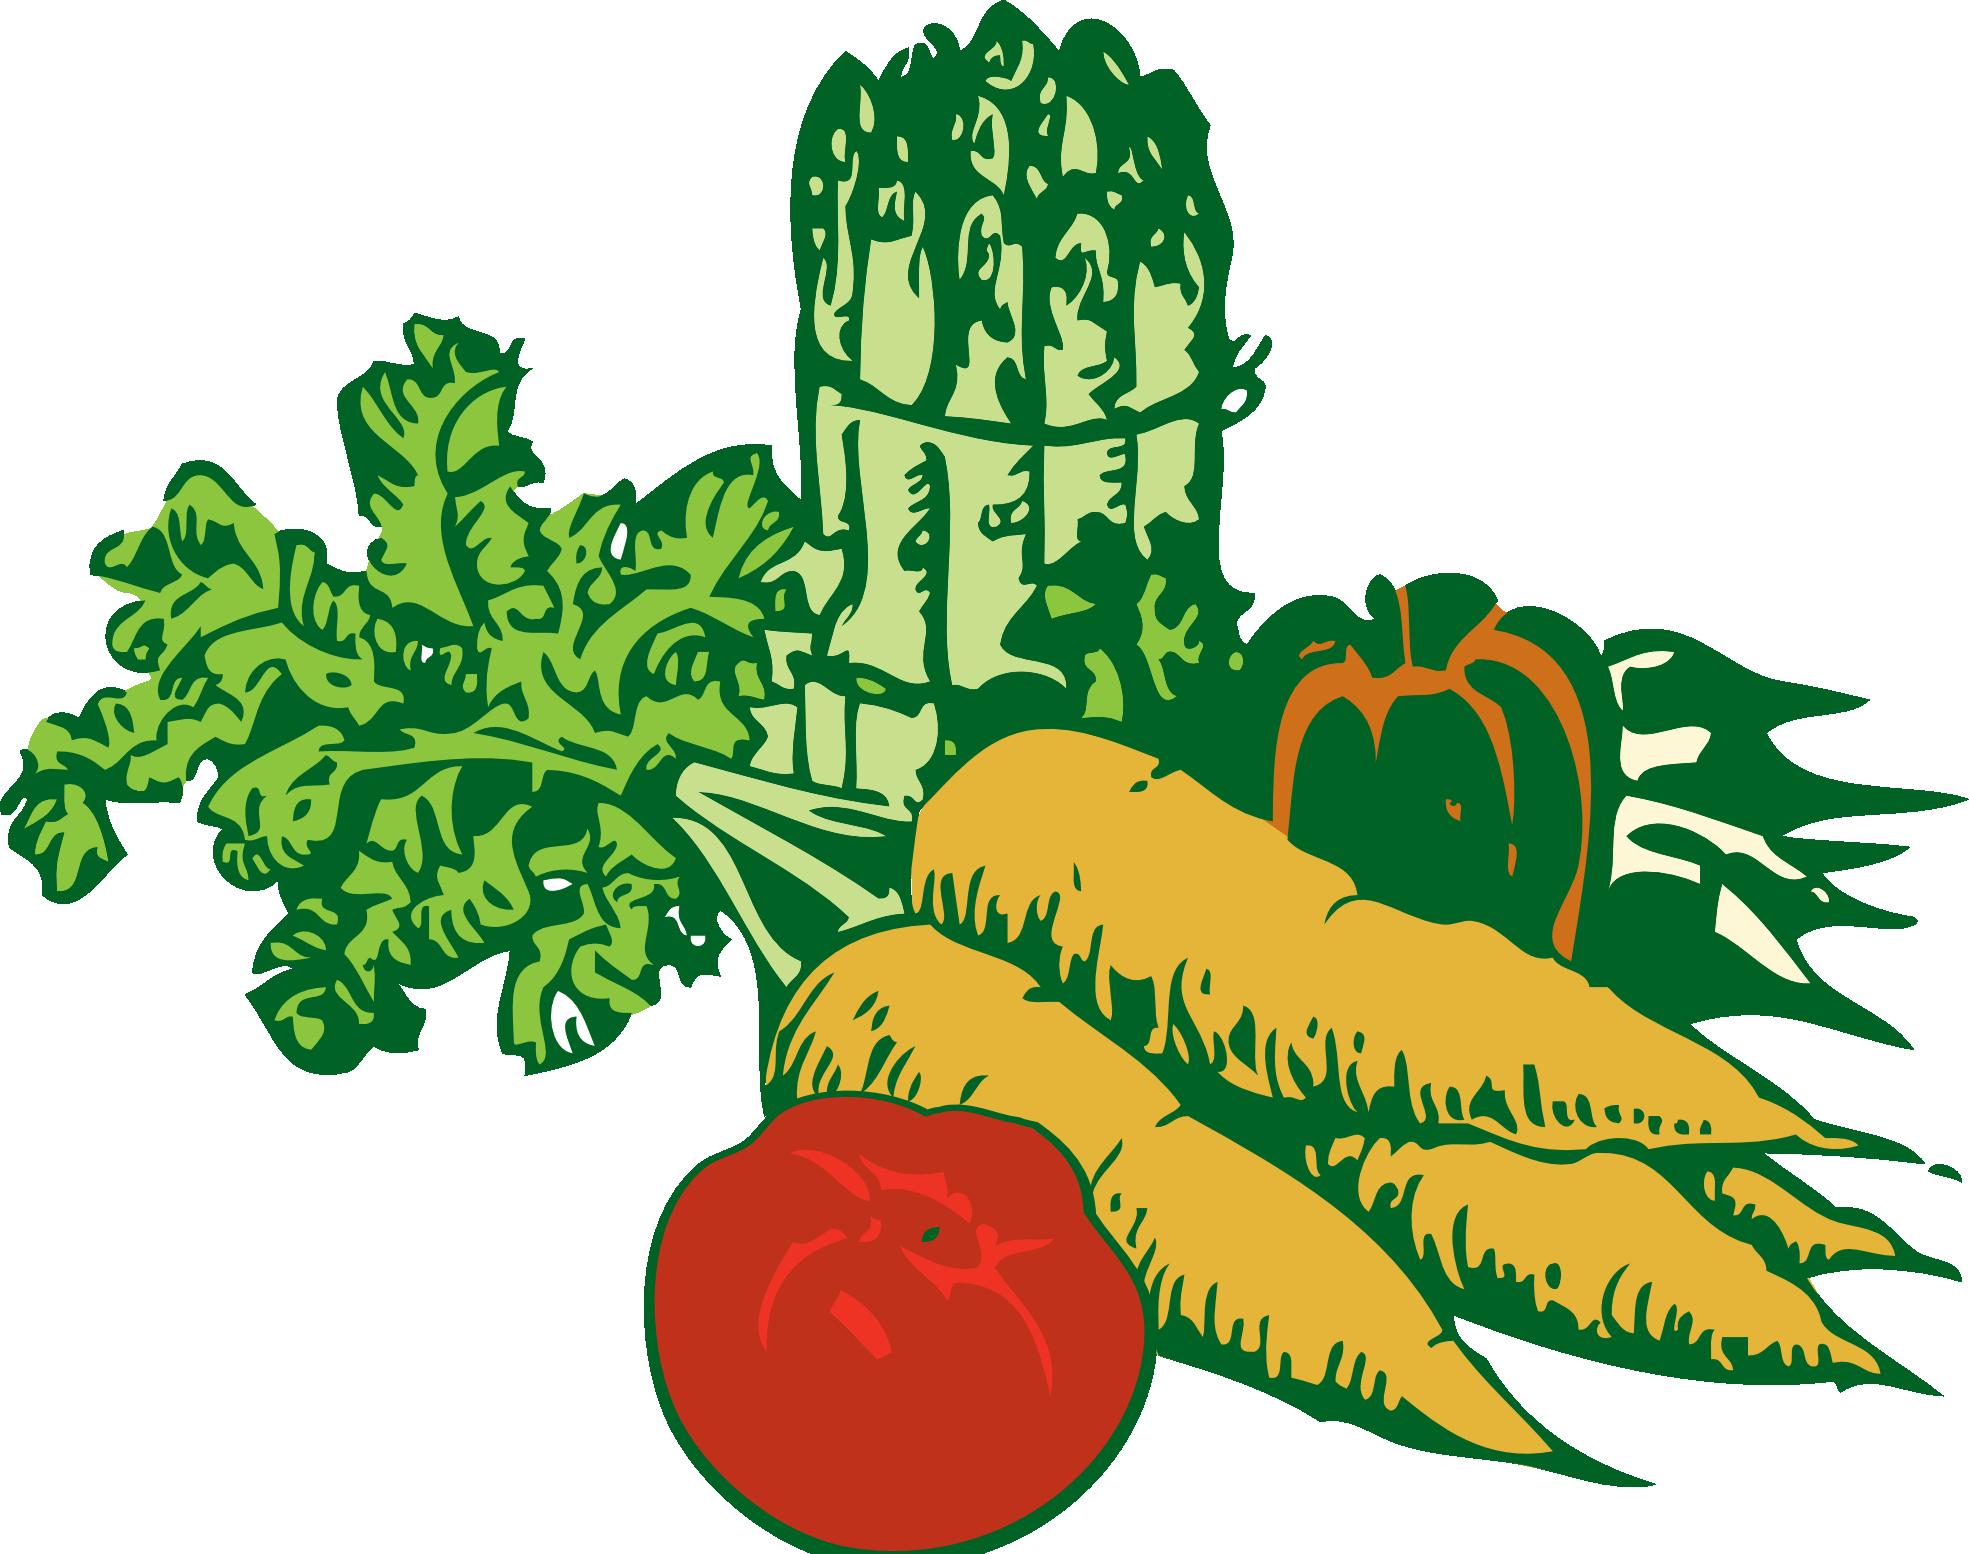 Vegetable Clip Art - Vegetable Clipart (1969x1554), Png Download